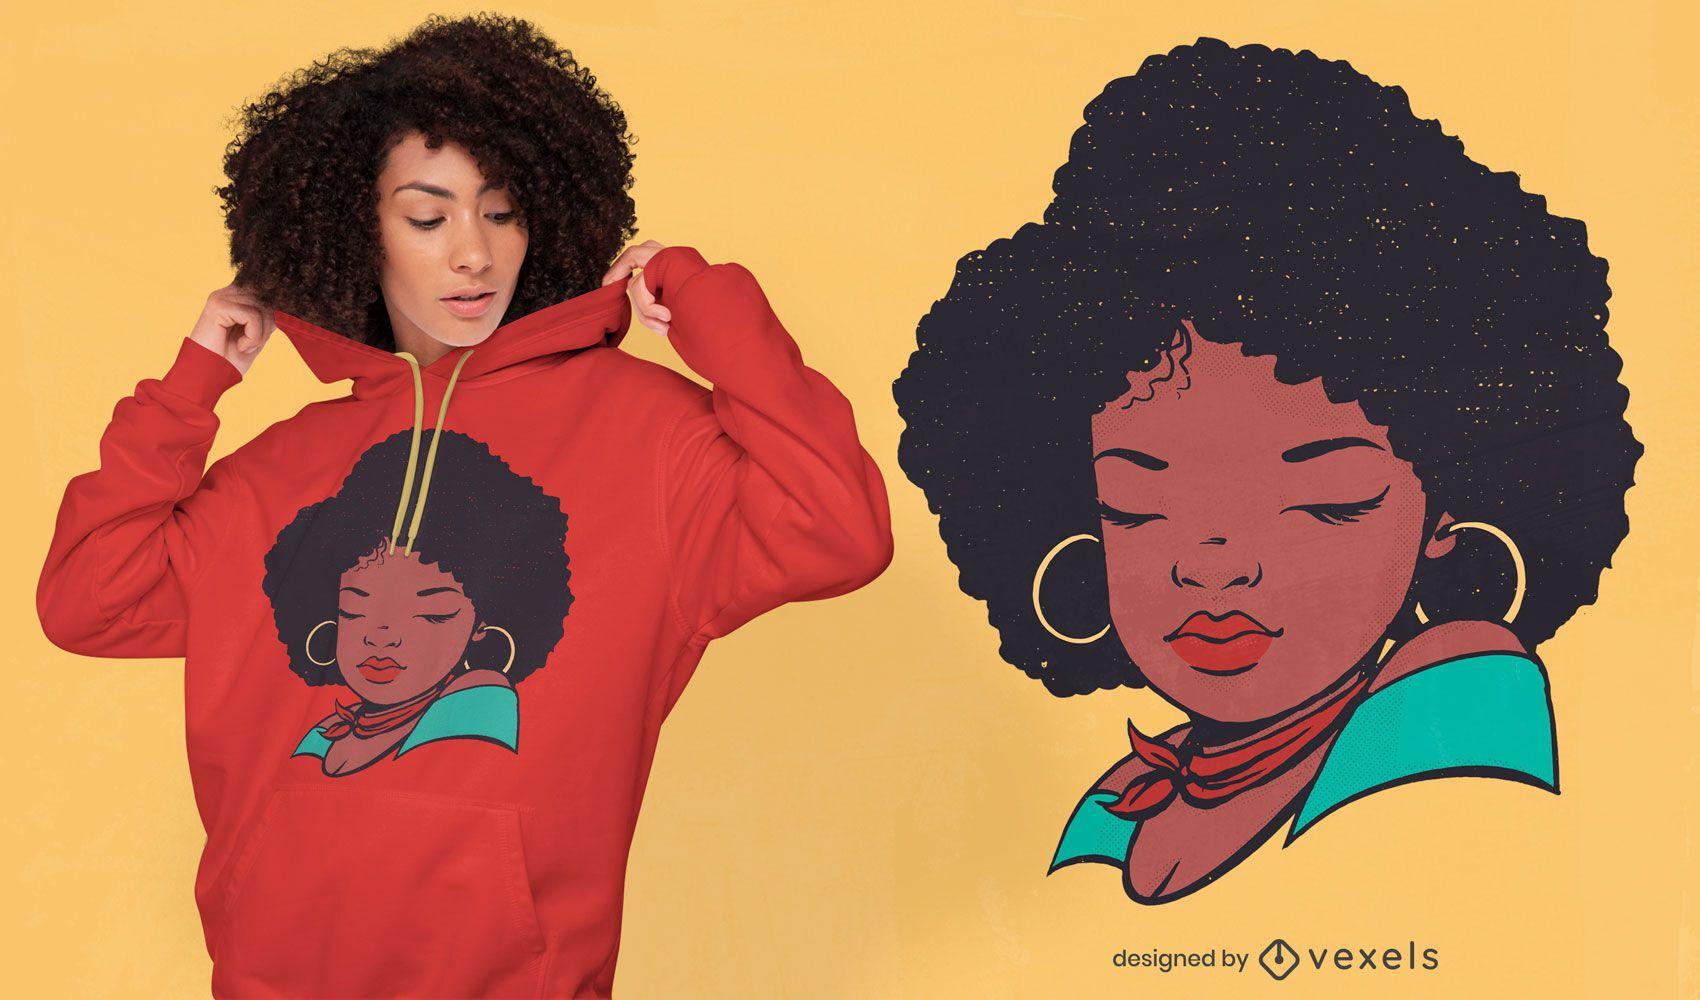 Afro woman t-shirt design